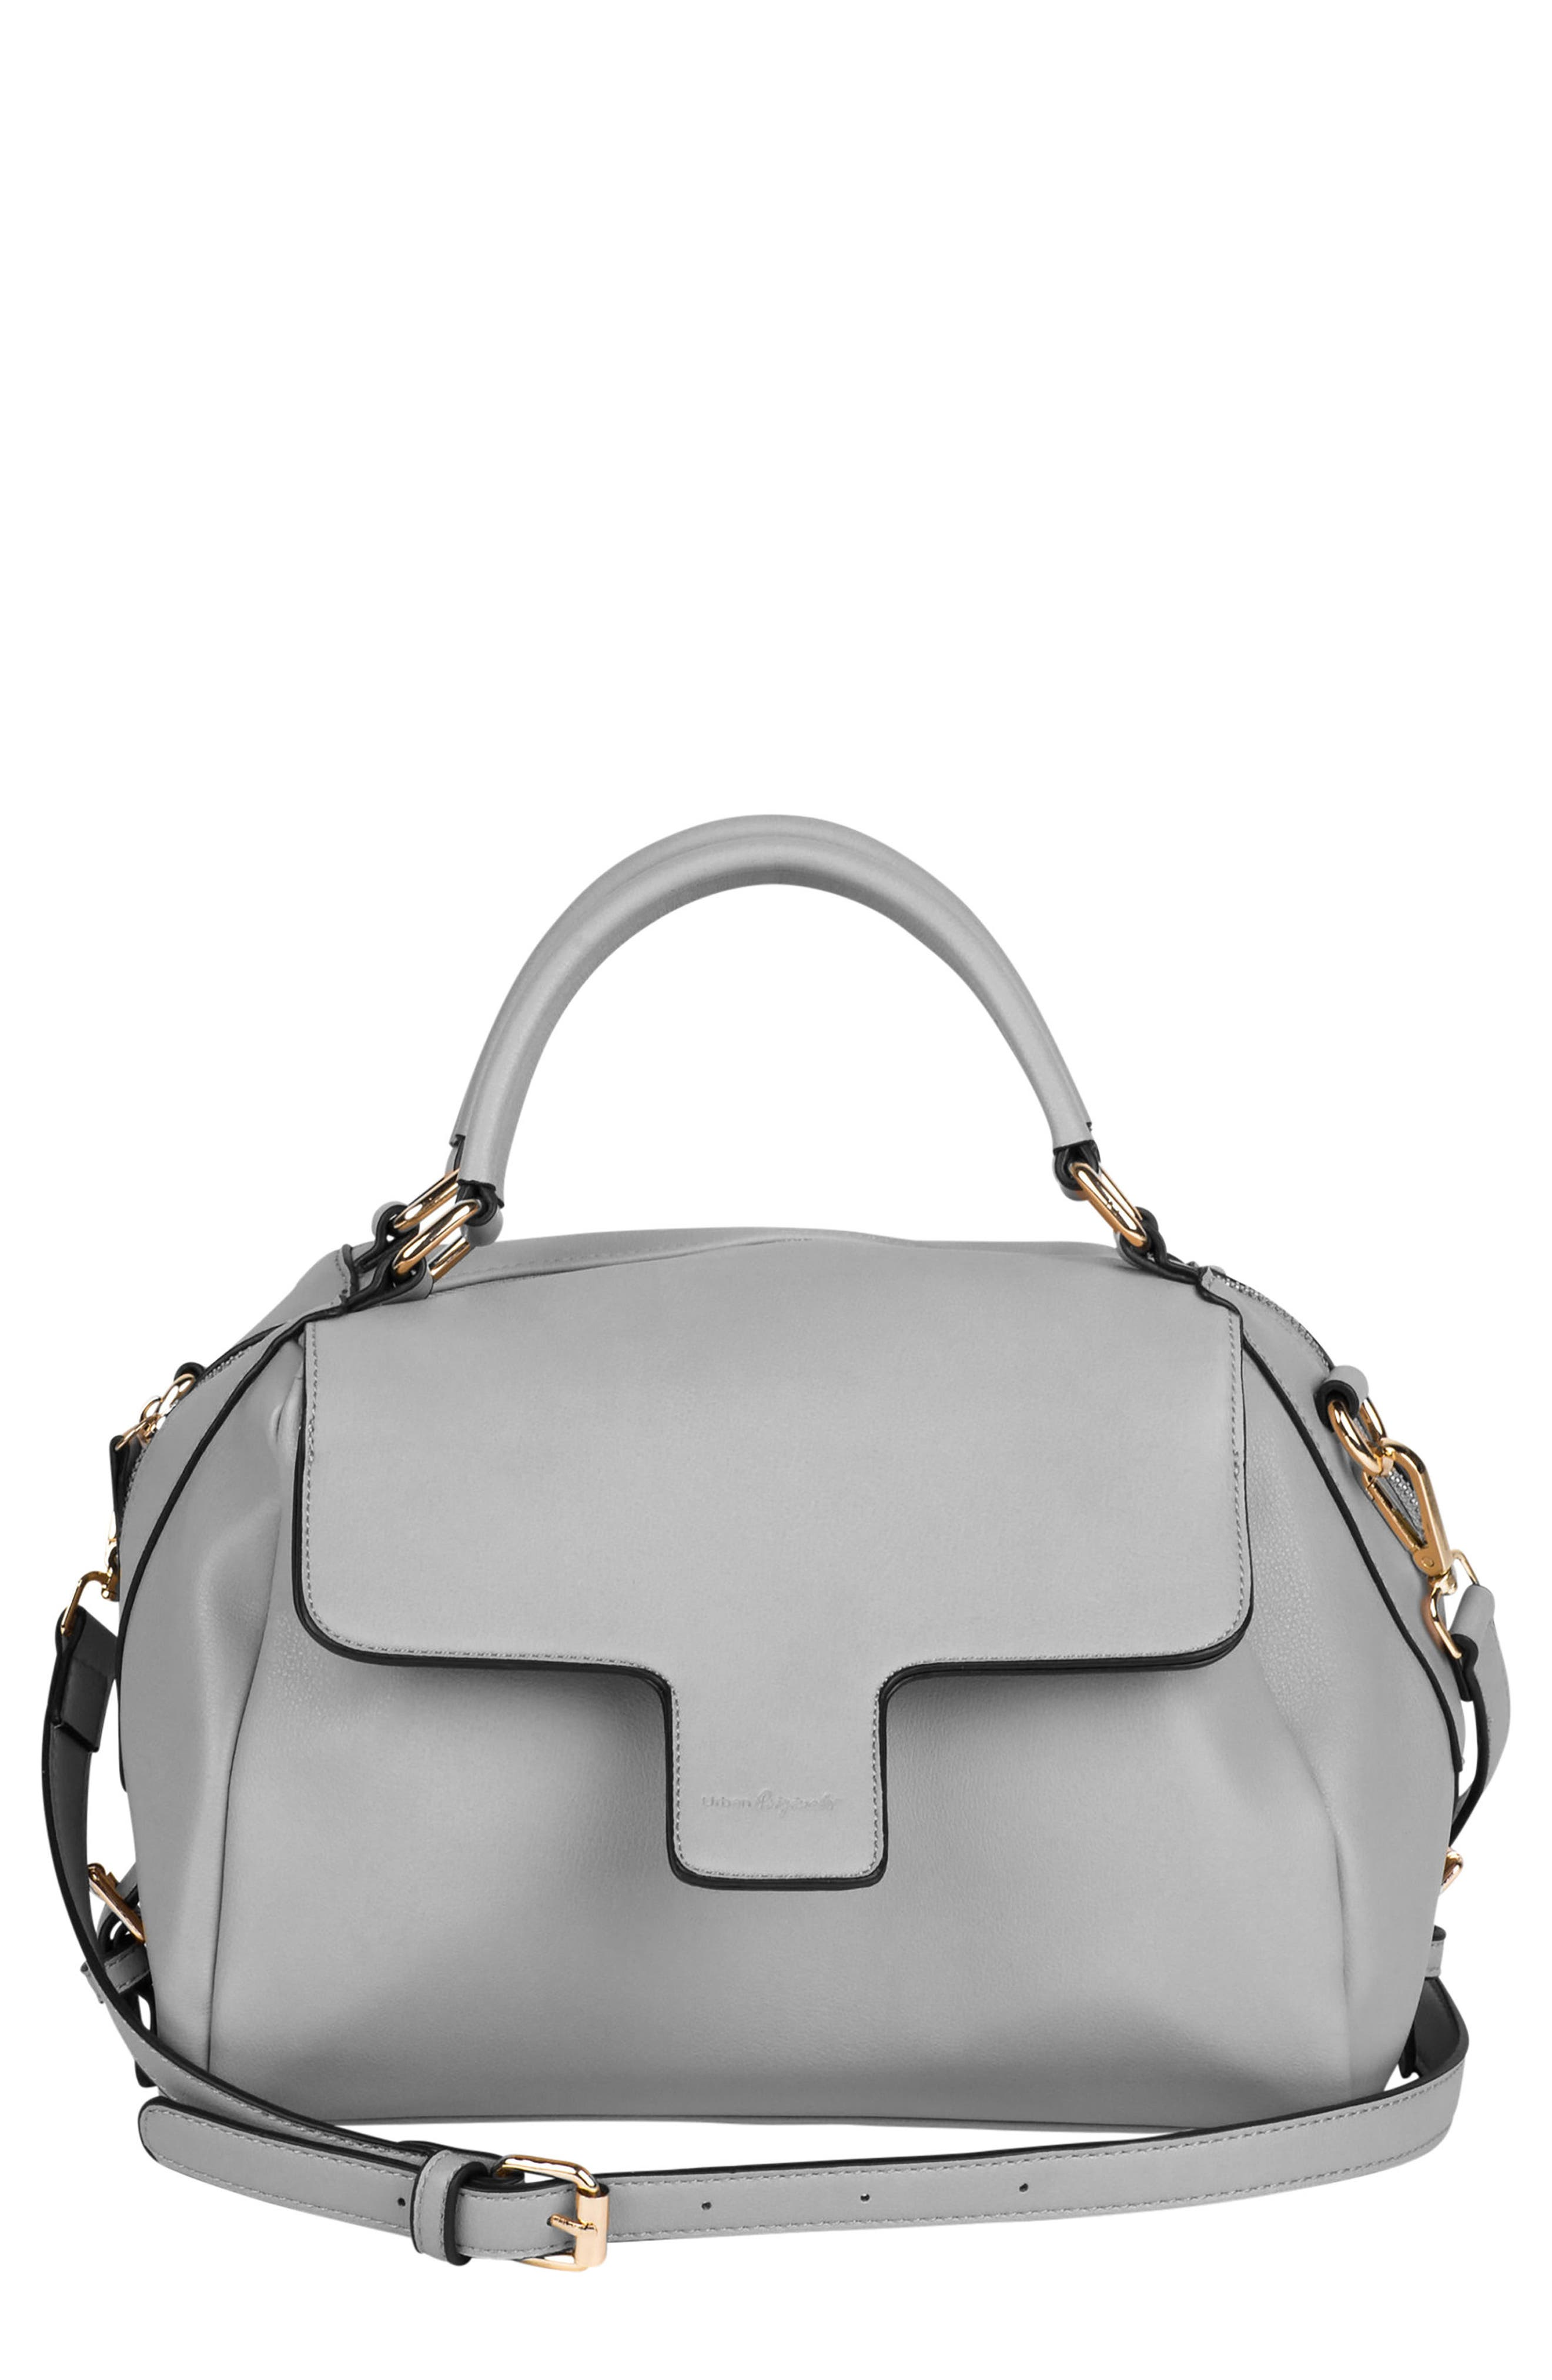 Twilight Vegan Leather Convertible Tote Bag, Main, color, 020